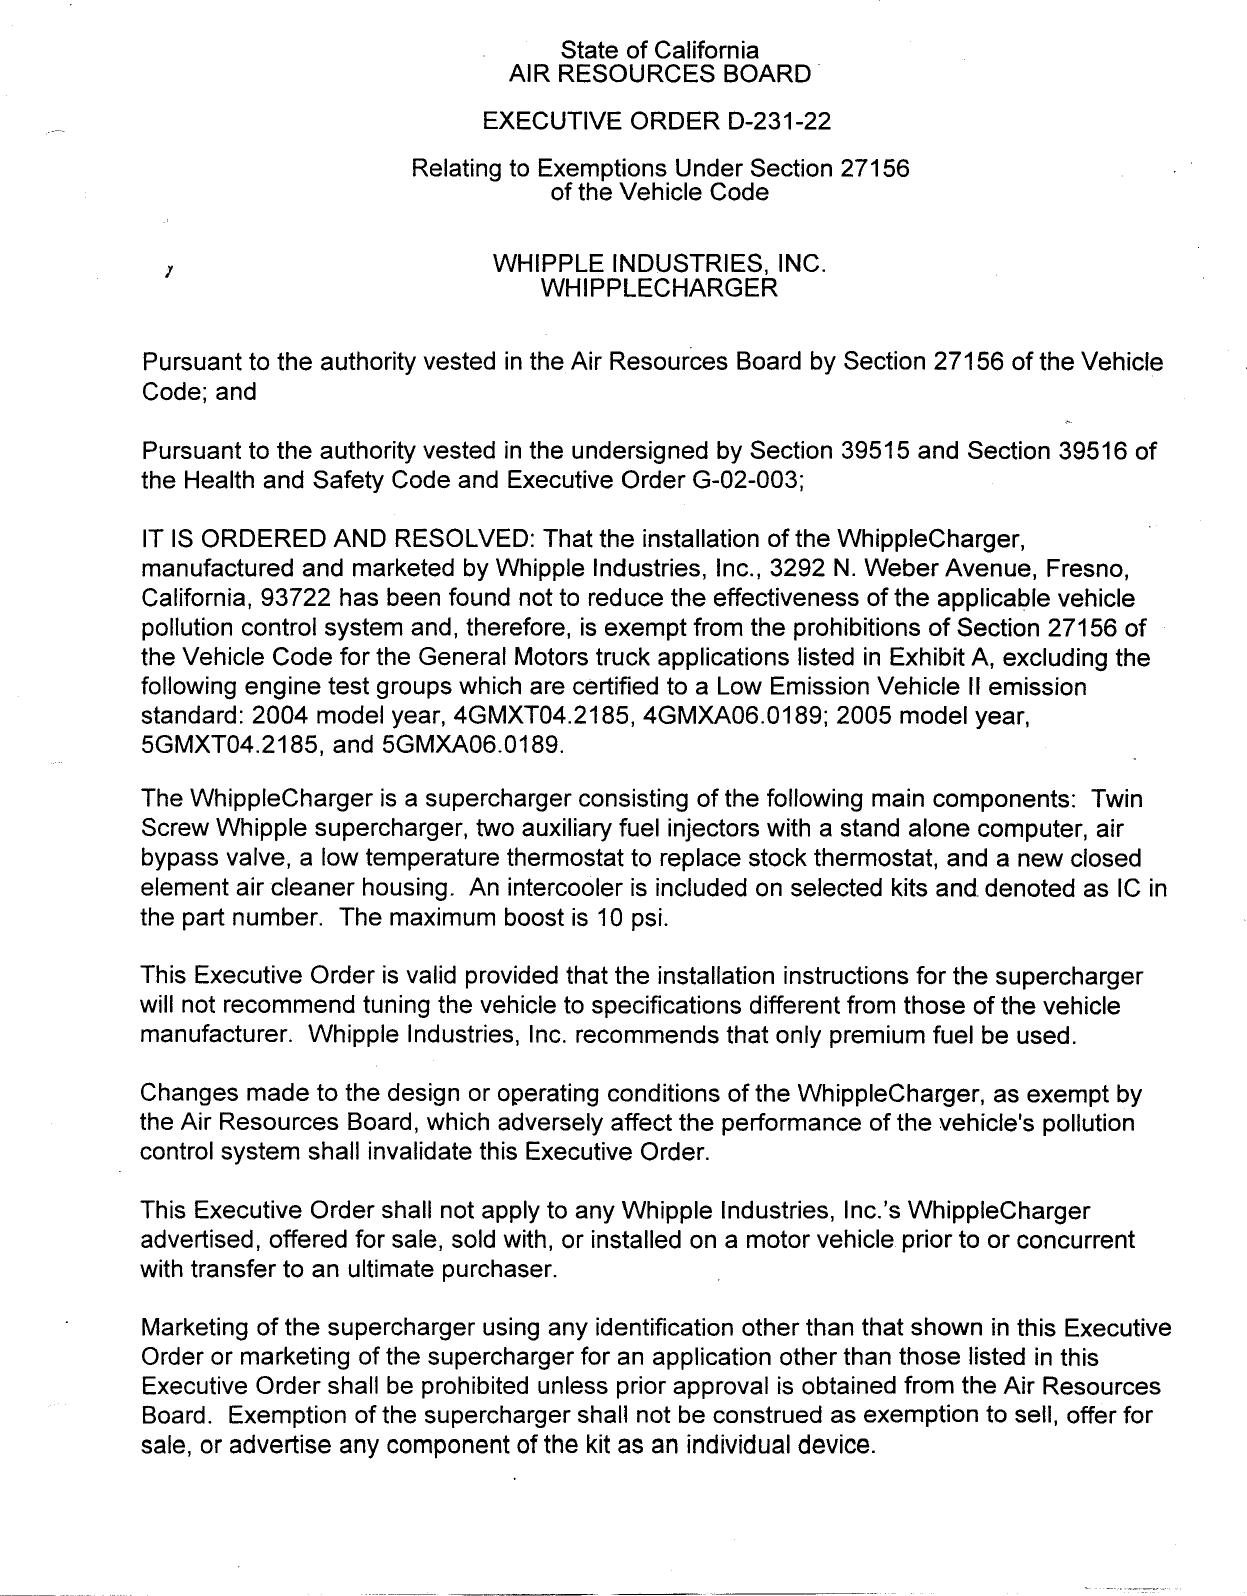 Executive Order D-231-22 Whipple Industries, Inc